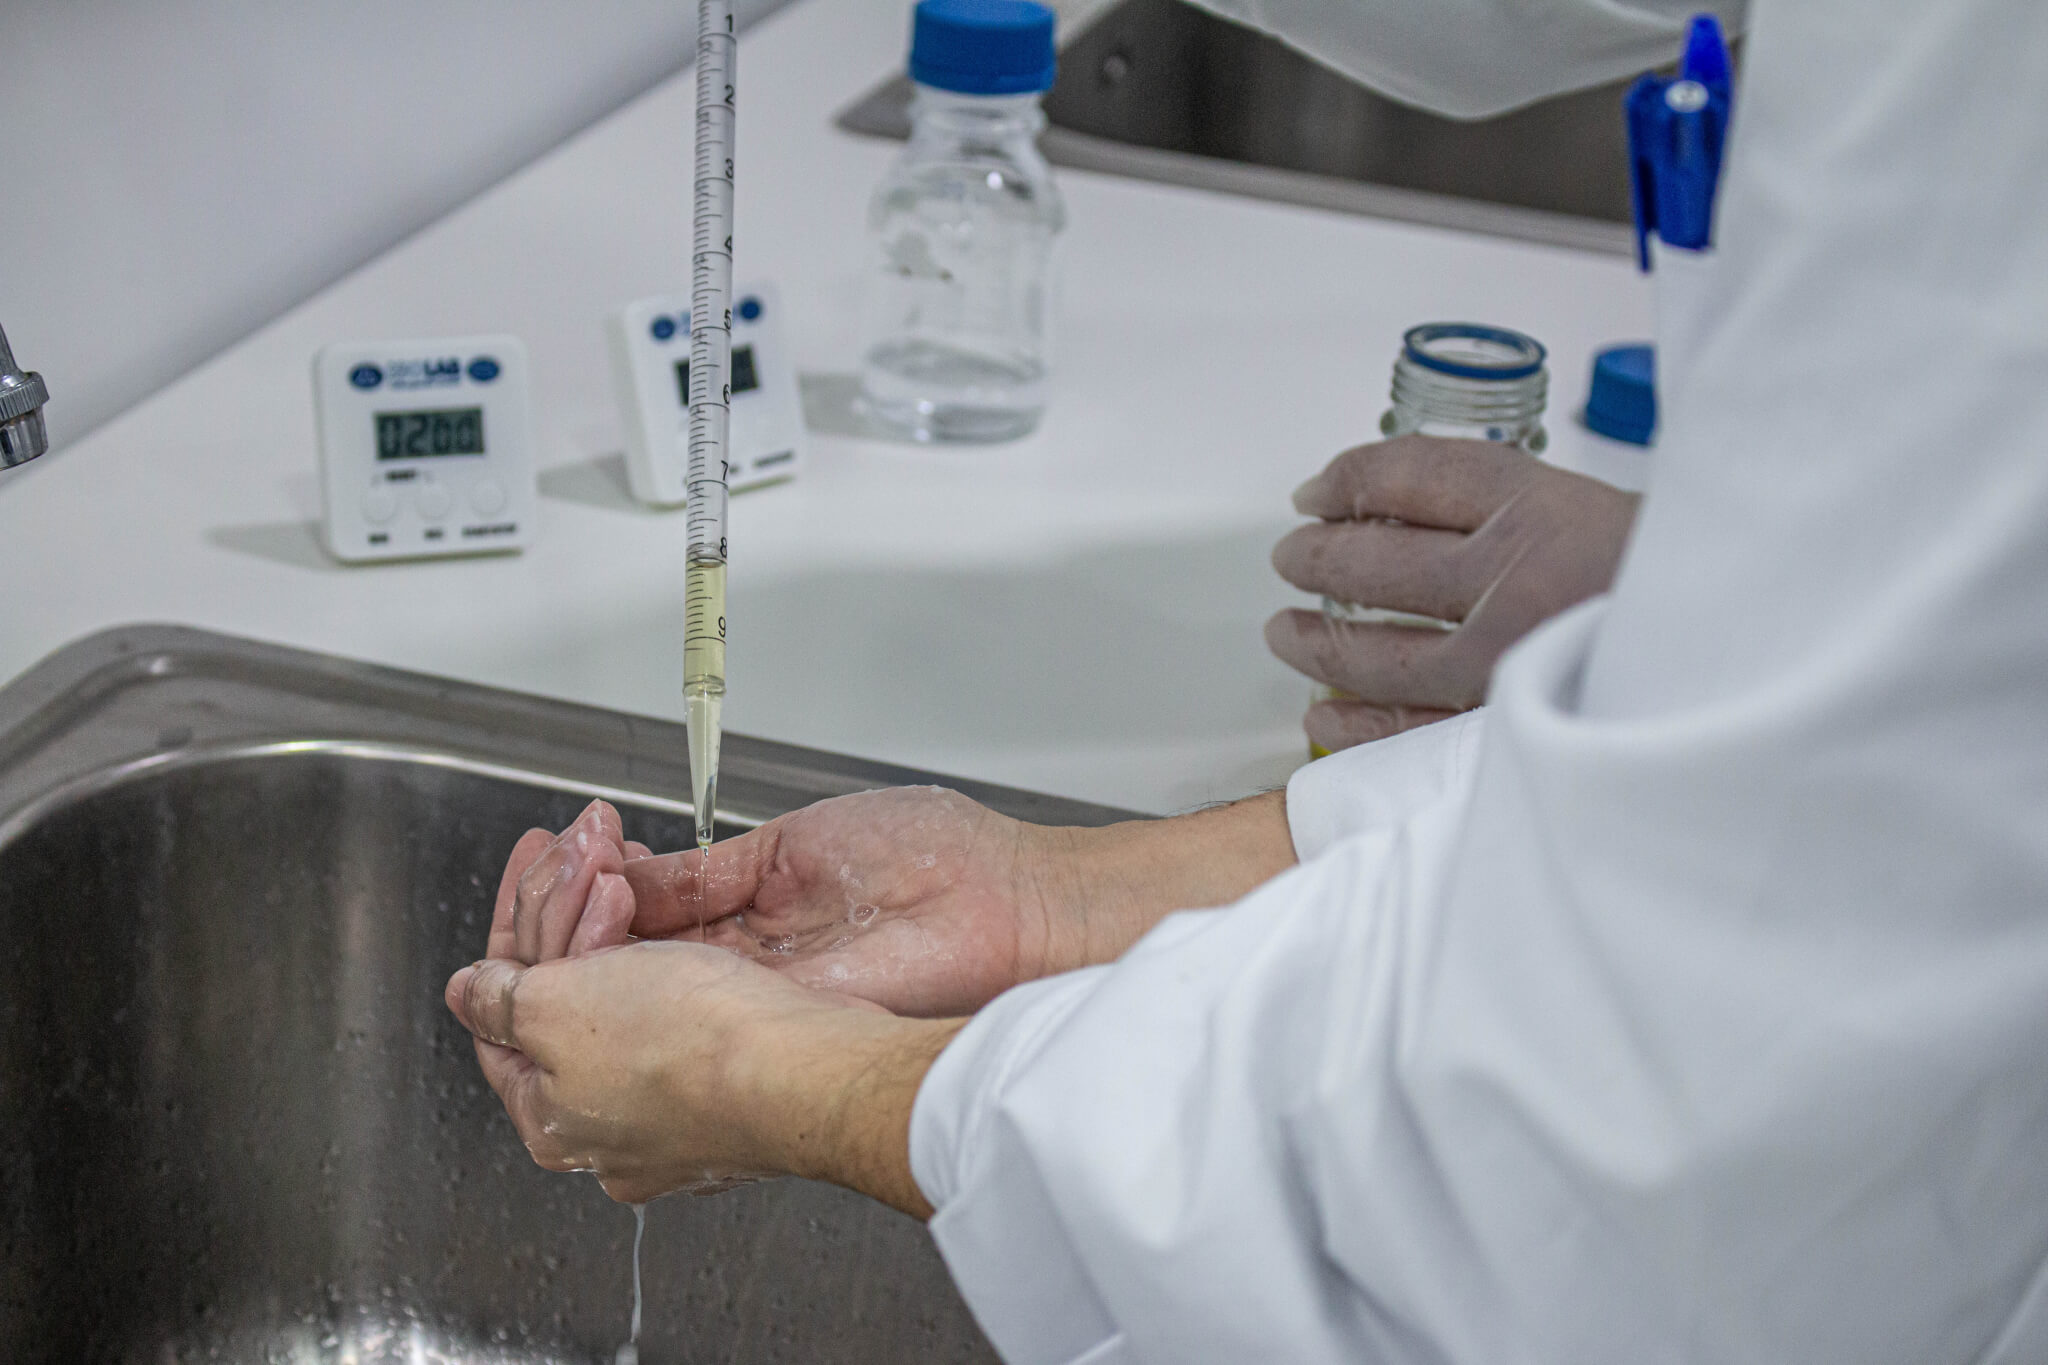 residual effectiveness, ASTM E2752, Standard Guide for Evaluation of Residual Effectiveness, antimicrobial efficacy testing, evaluation of residual efficacy